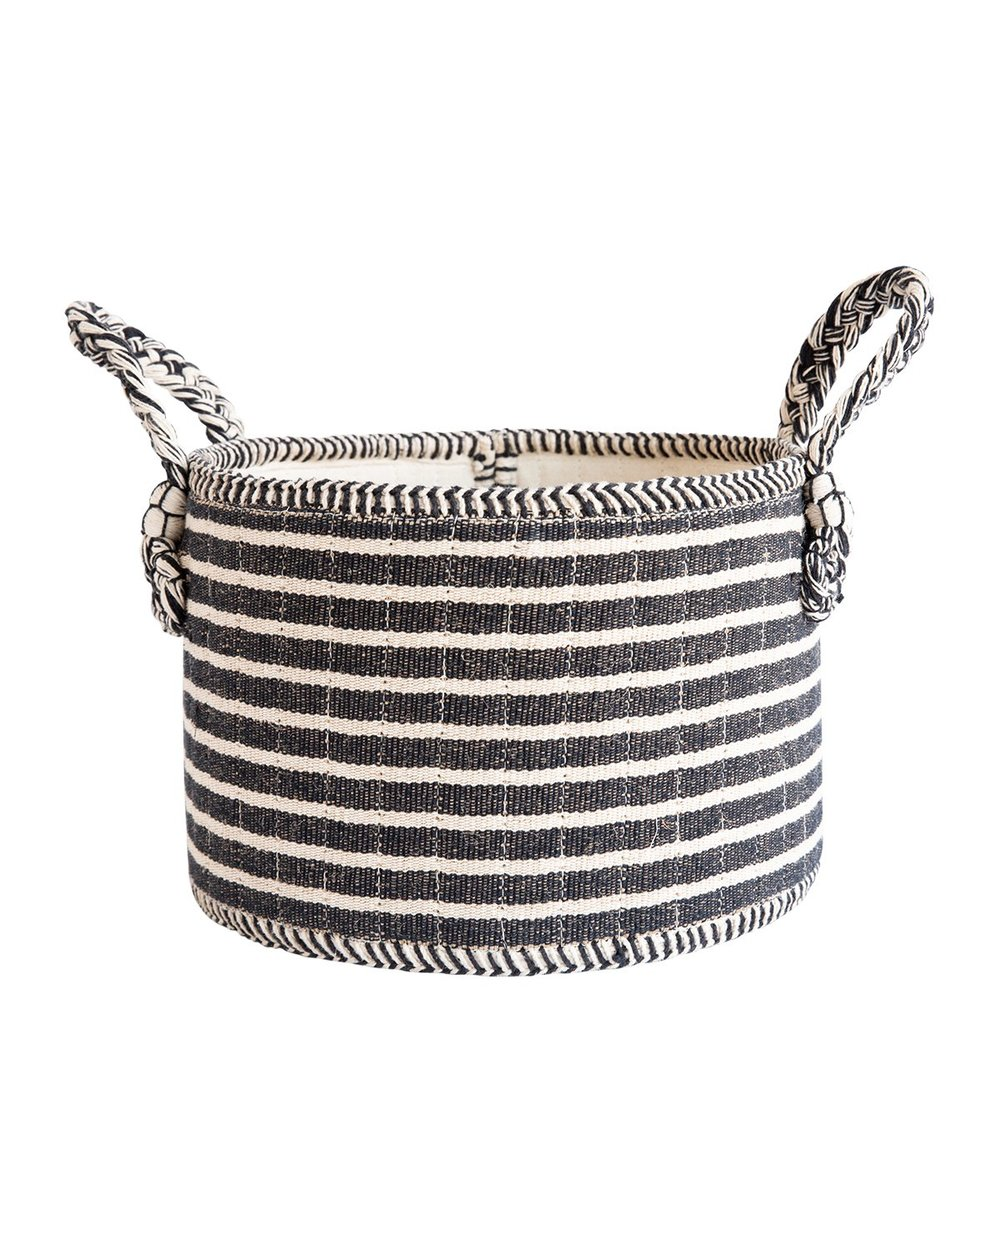 Black_White_Stripe_Baskets_12 2.jpg